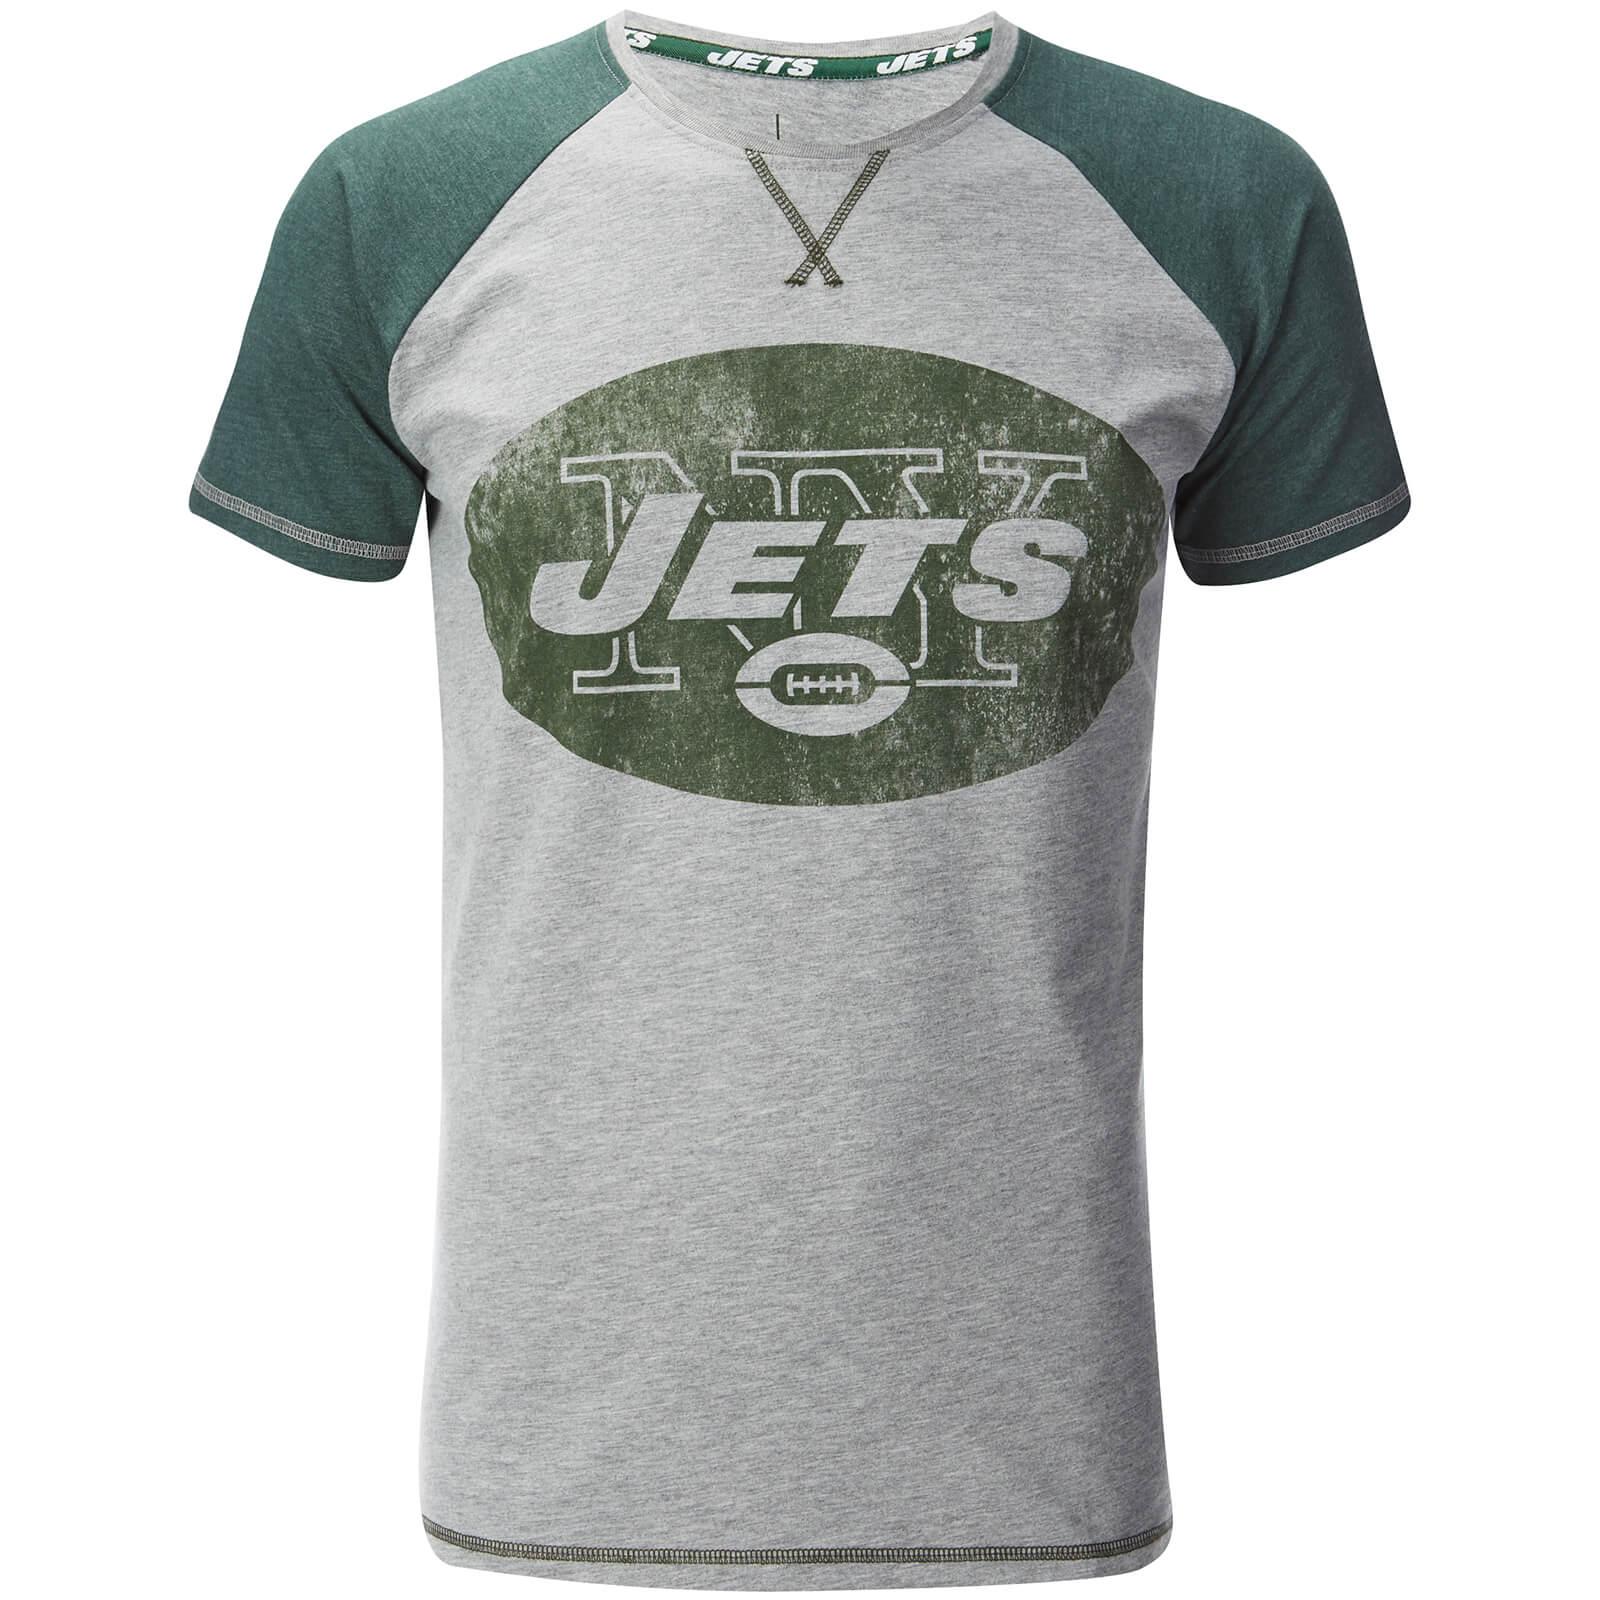 92660bc43 NFL Men s New York Jets Logo Contrast Sleeve T-Shirt - Grey